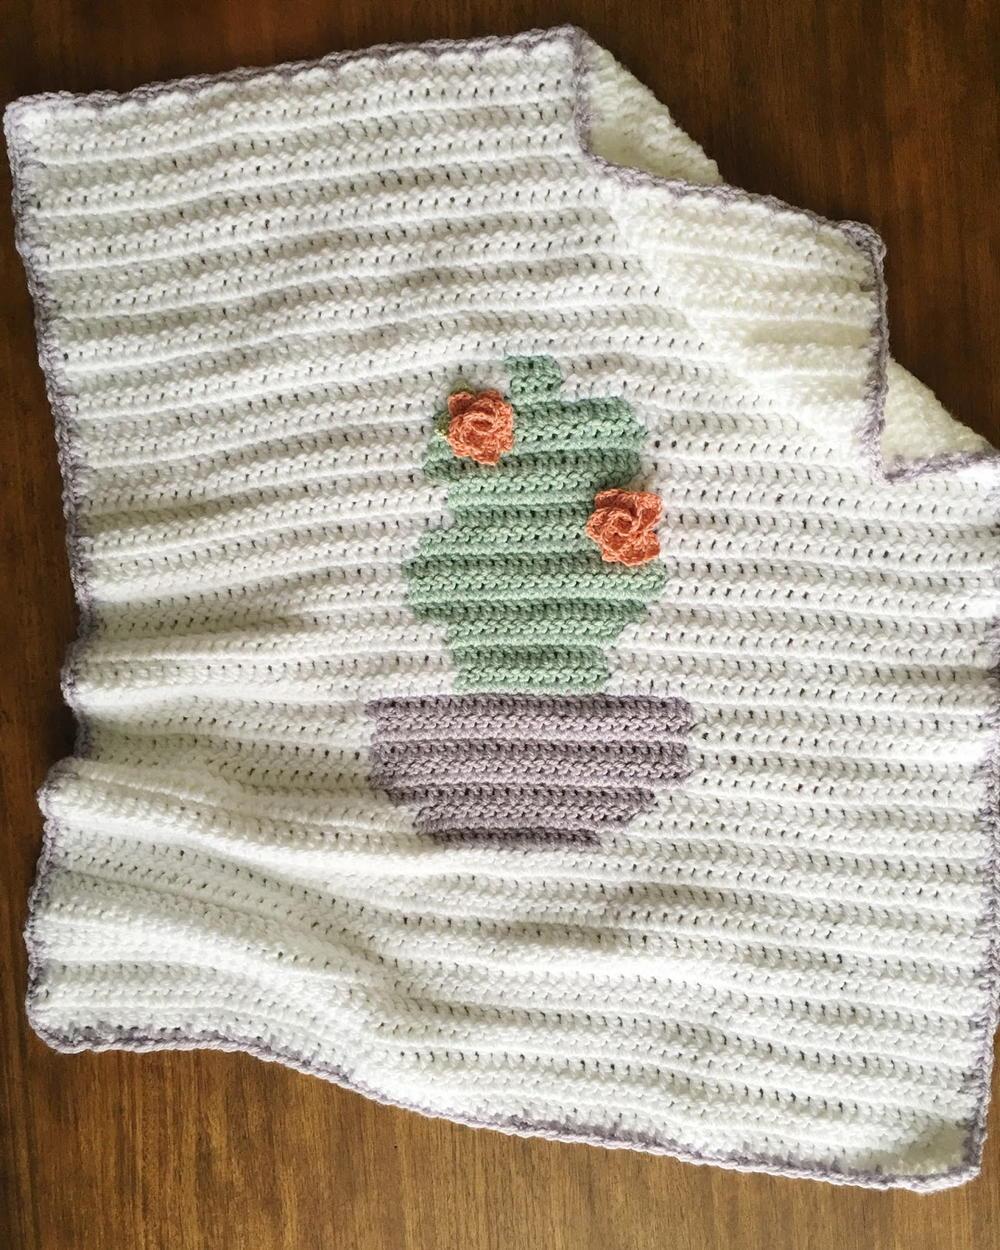 Baby Bamboo Blanket Pattern: Summer Cactus Crochet Blanket